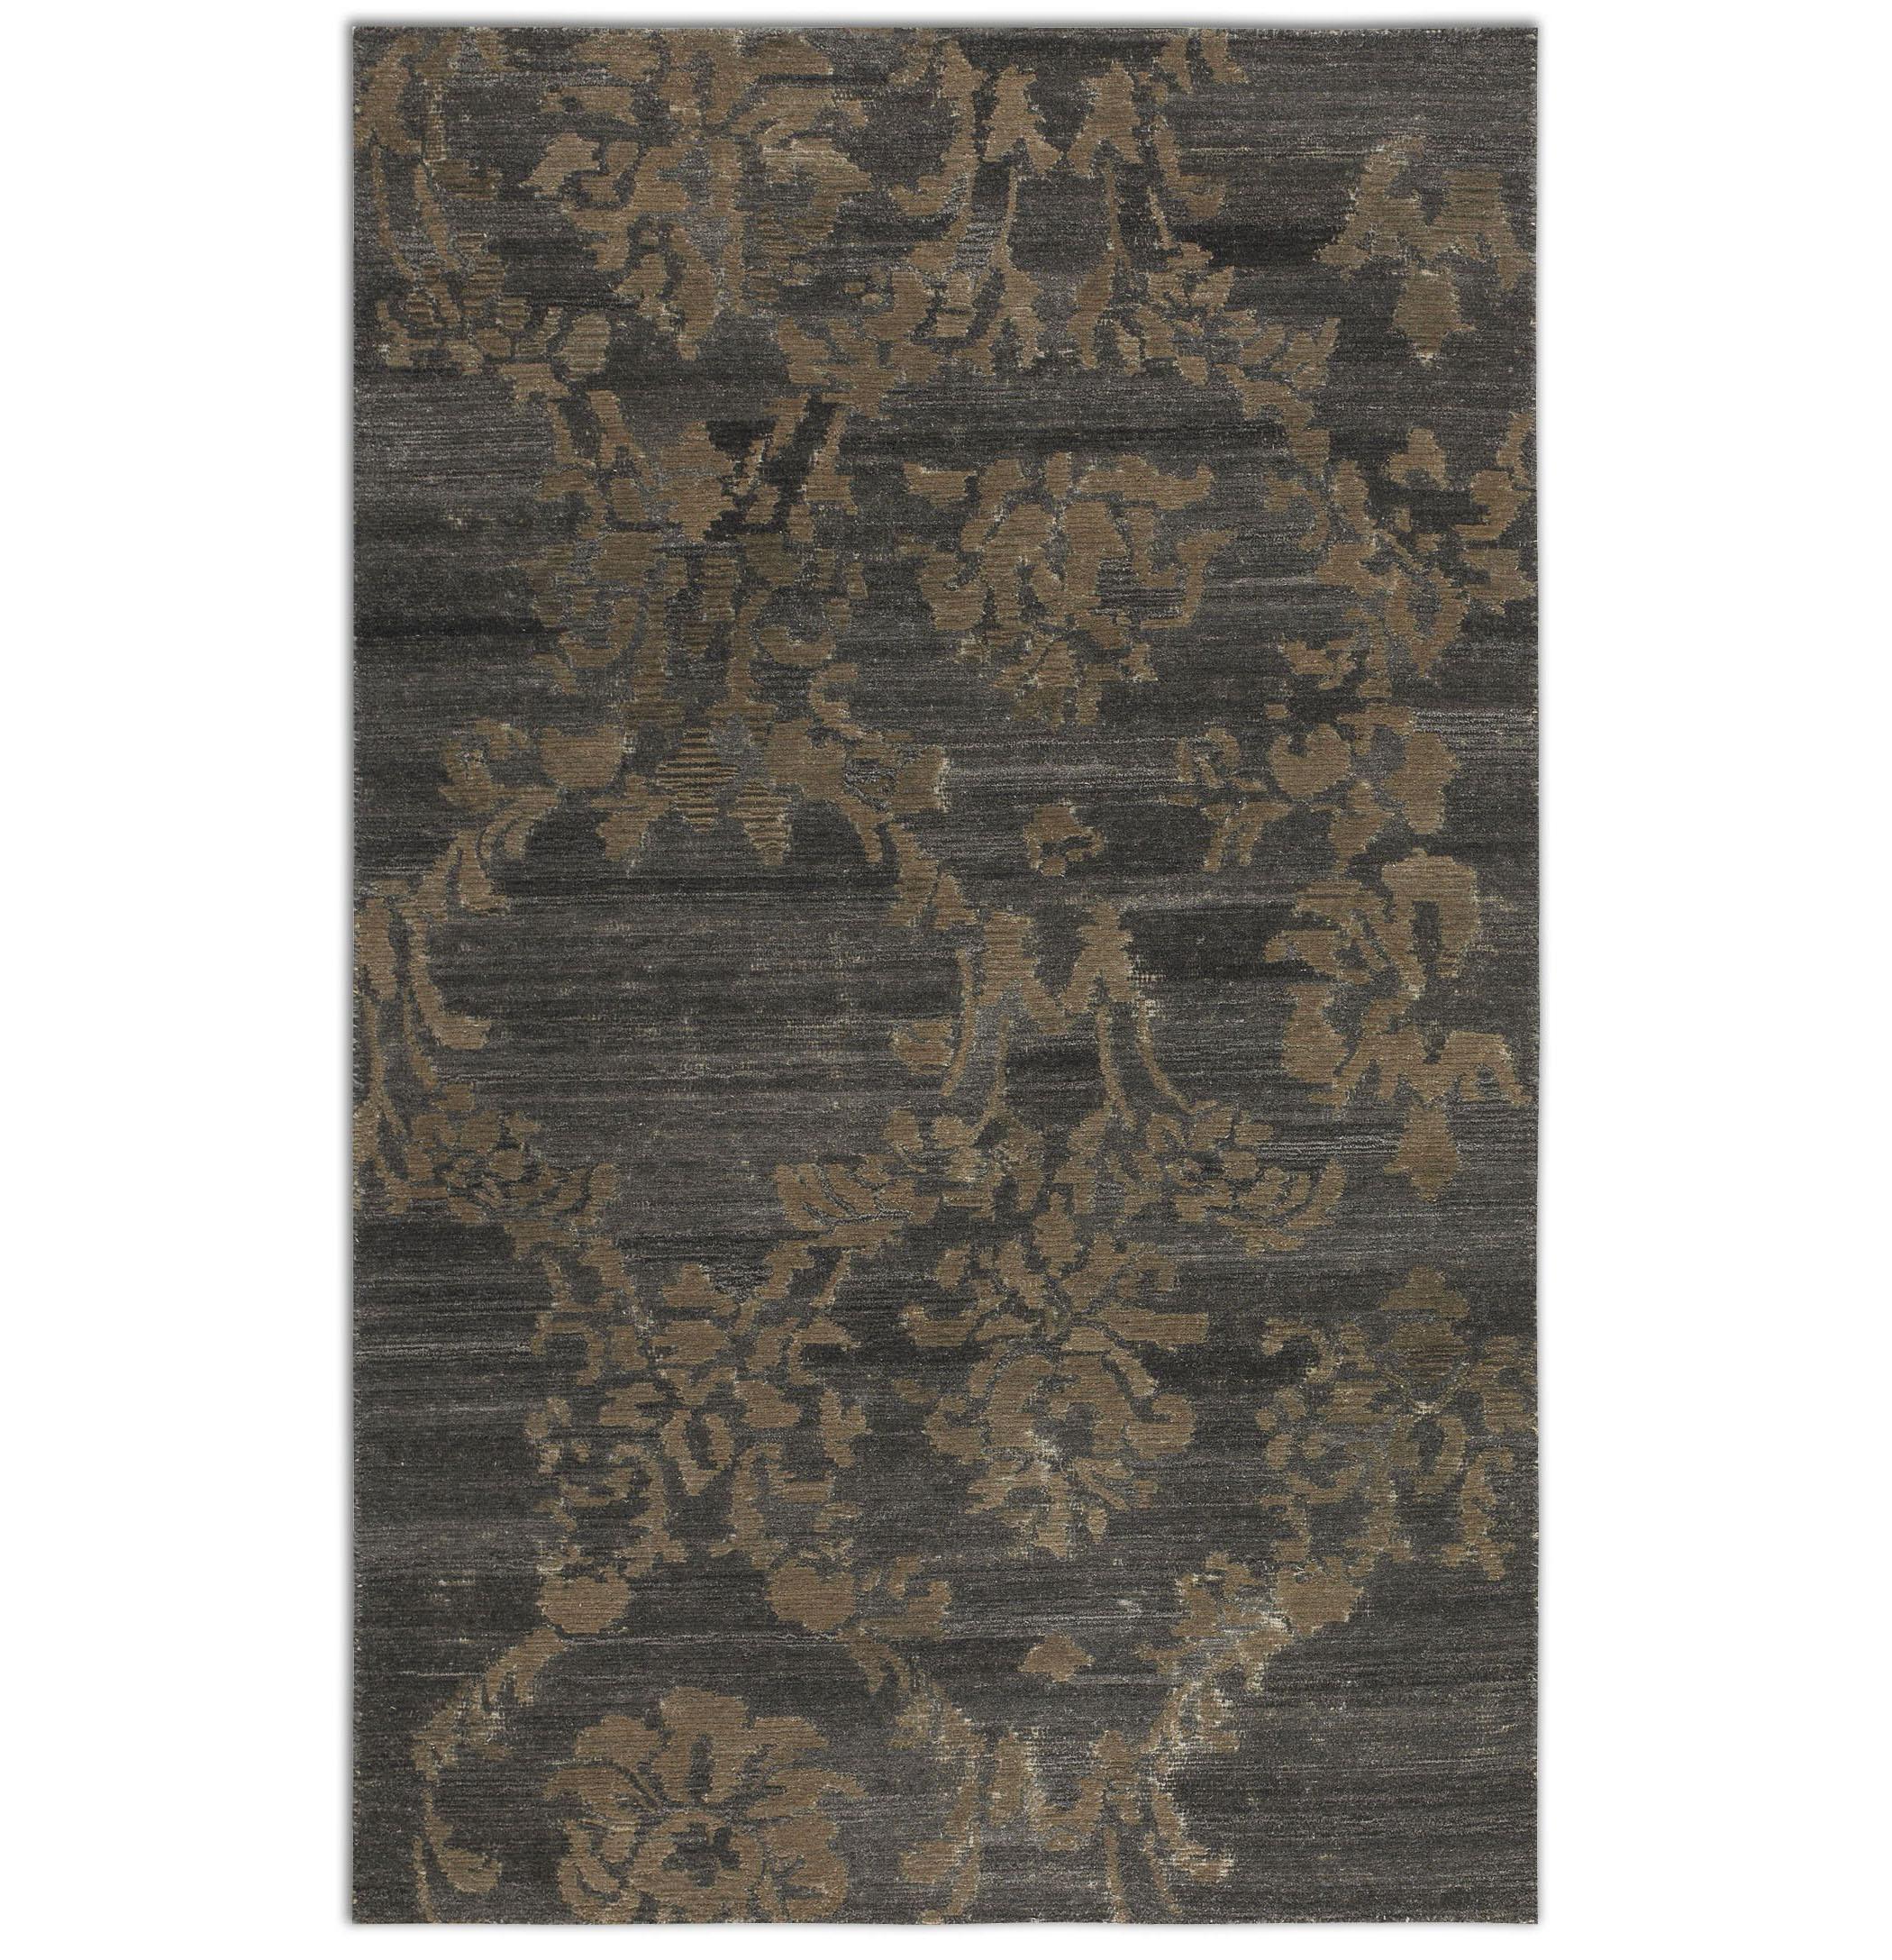 Uttermost Rugs Tavenna 8 X 10 Wool Rug - Item Number: 73046-8